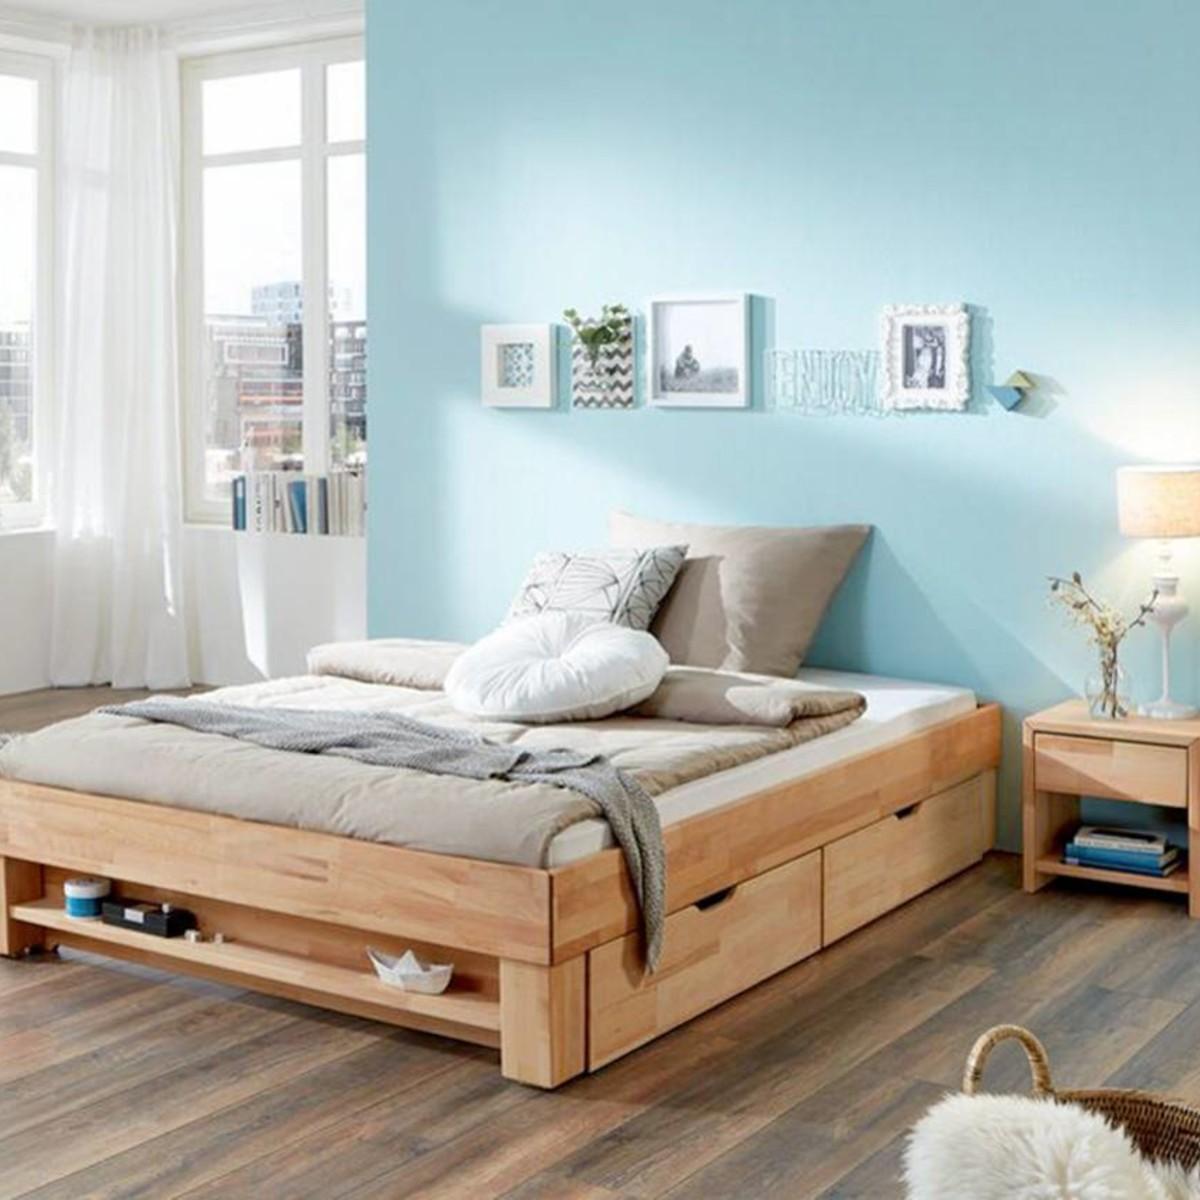 Beds And More Kinderbedden.Bedden Bij Furnea For The Sweetest Dreams